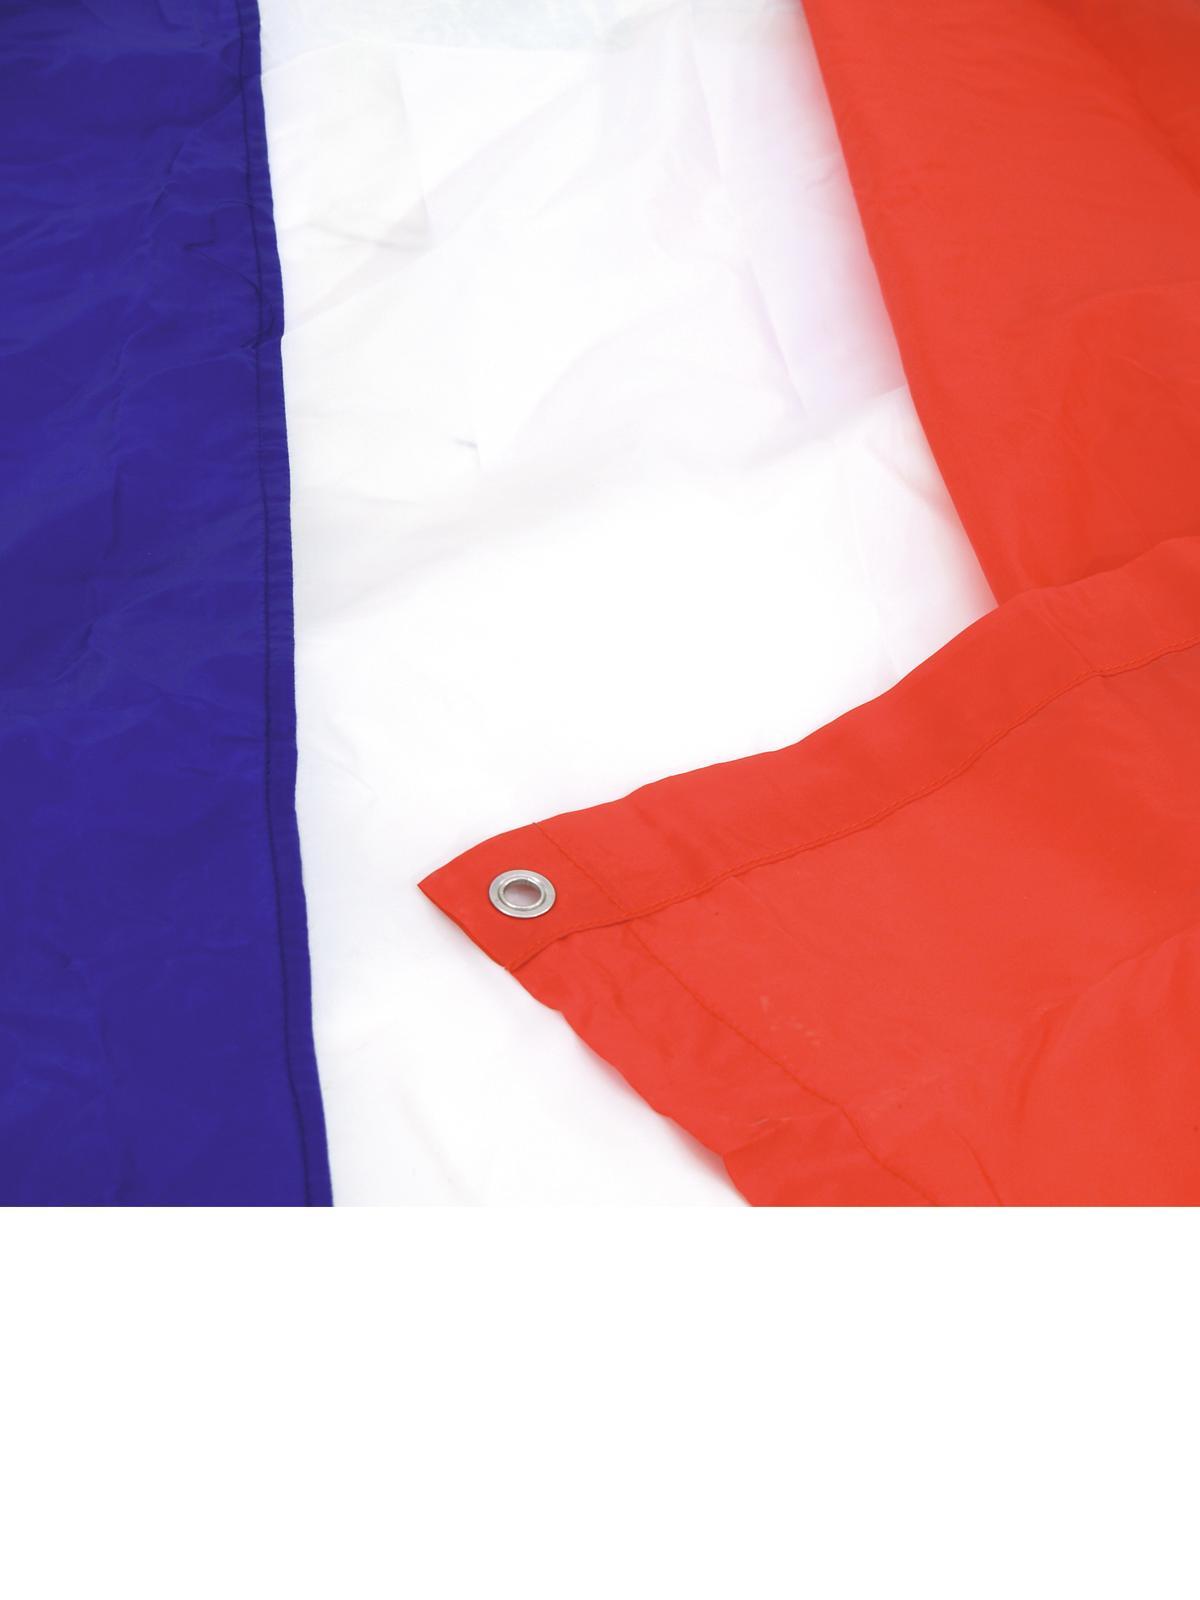 EUROPALMS Bandiera, Francia, 600x360cm